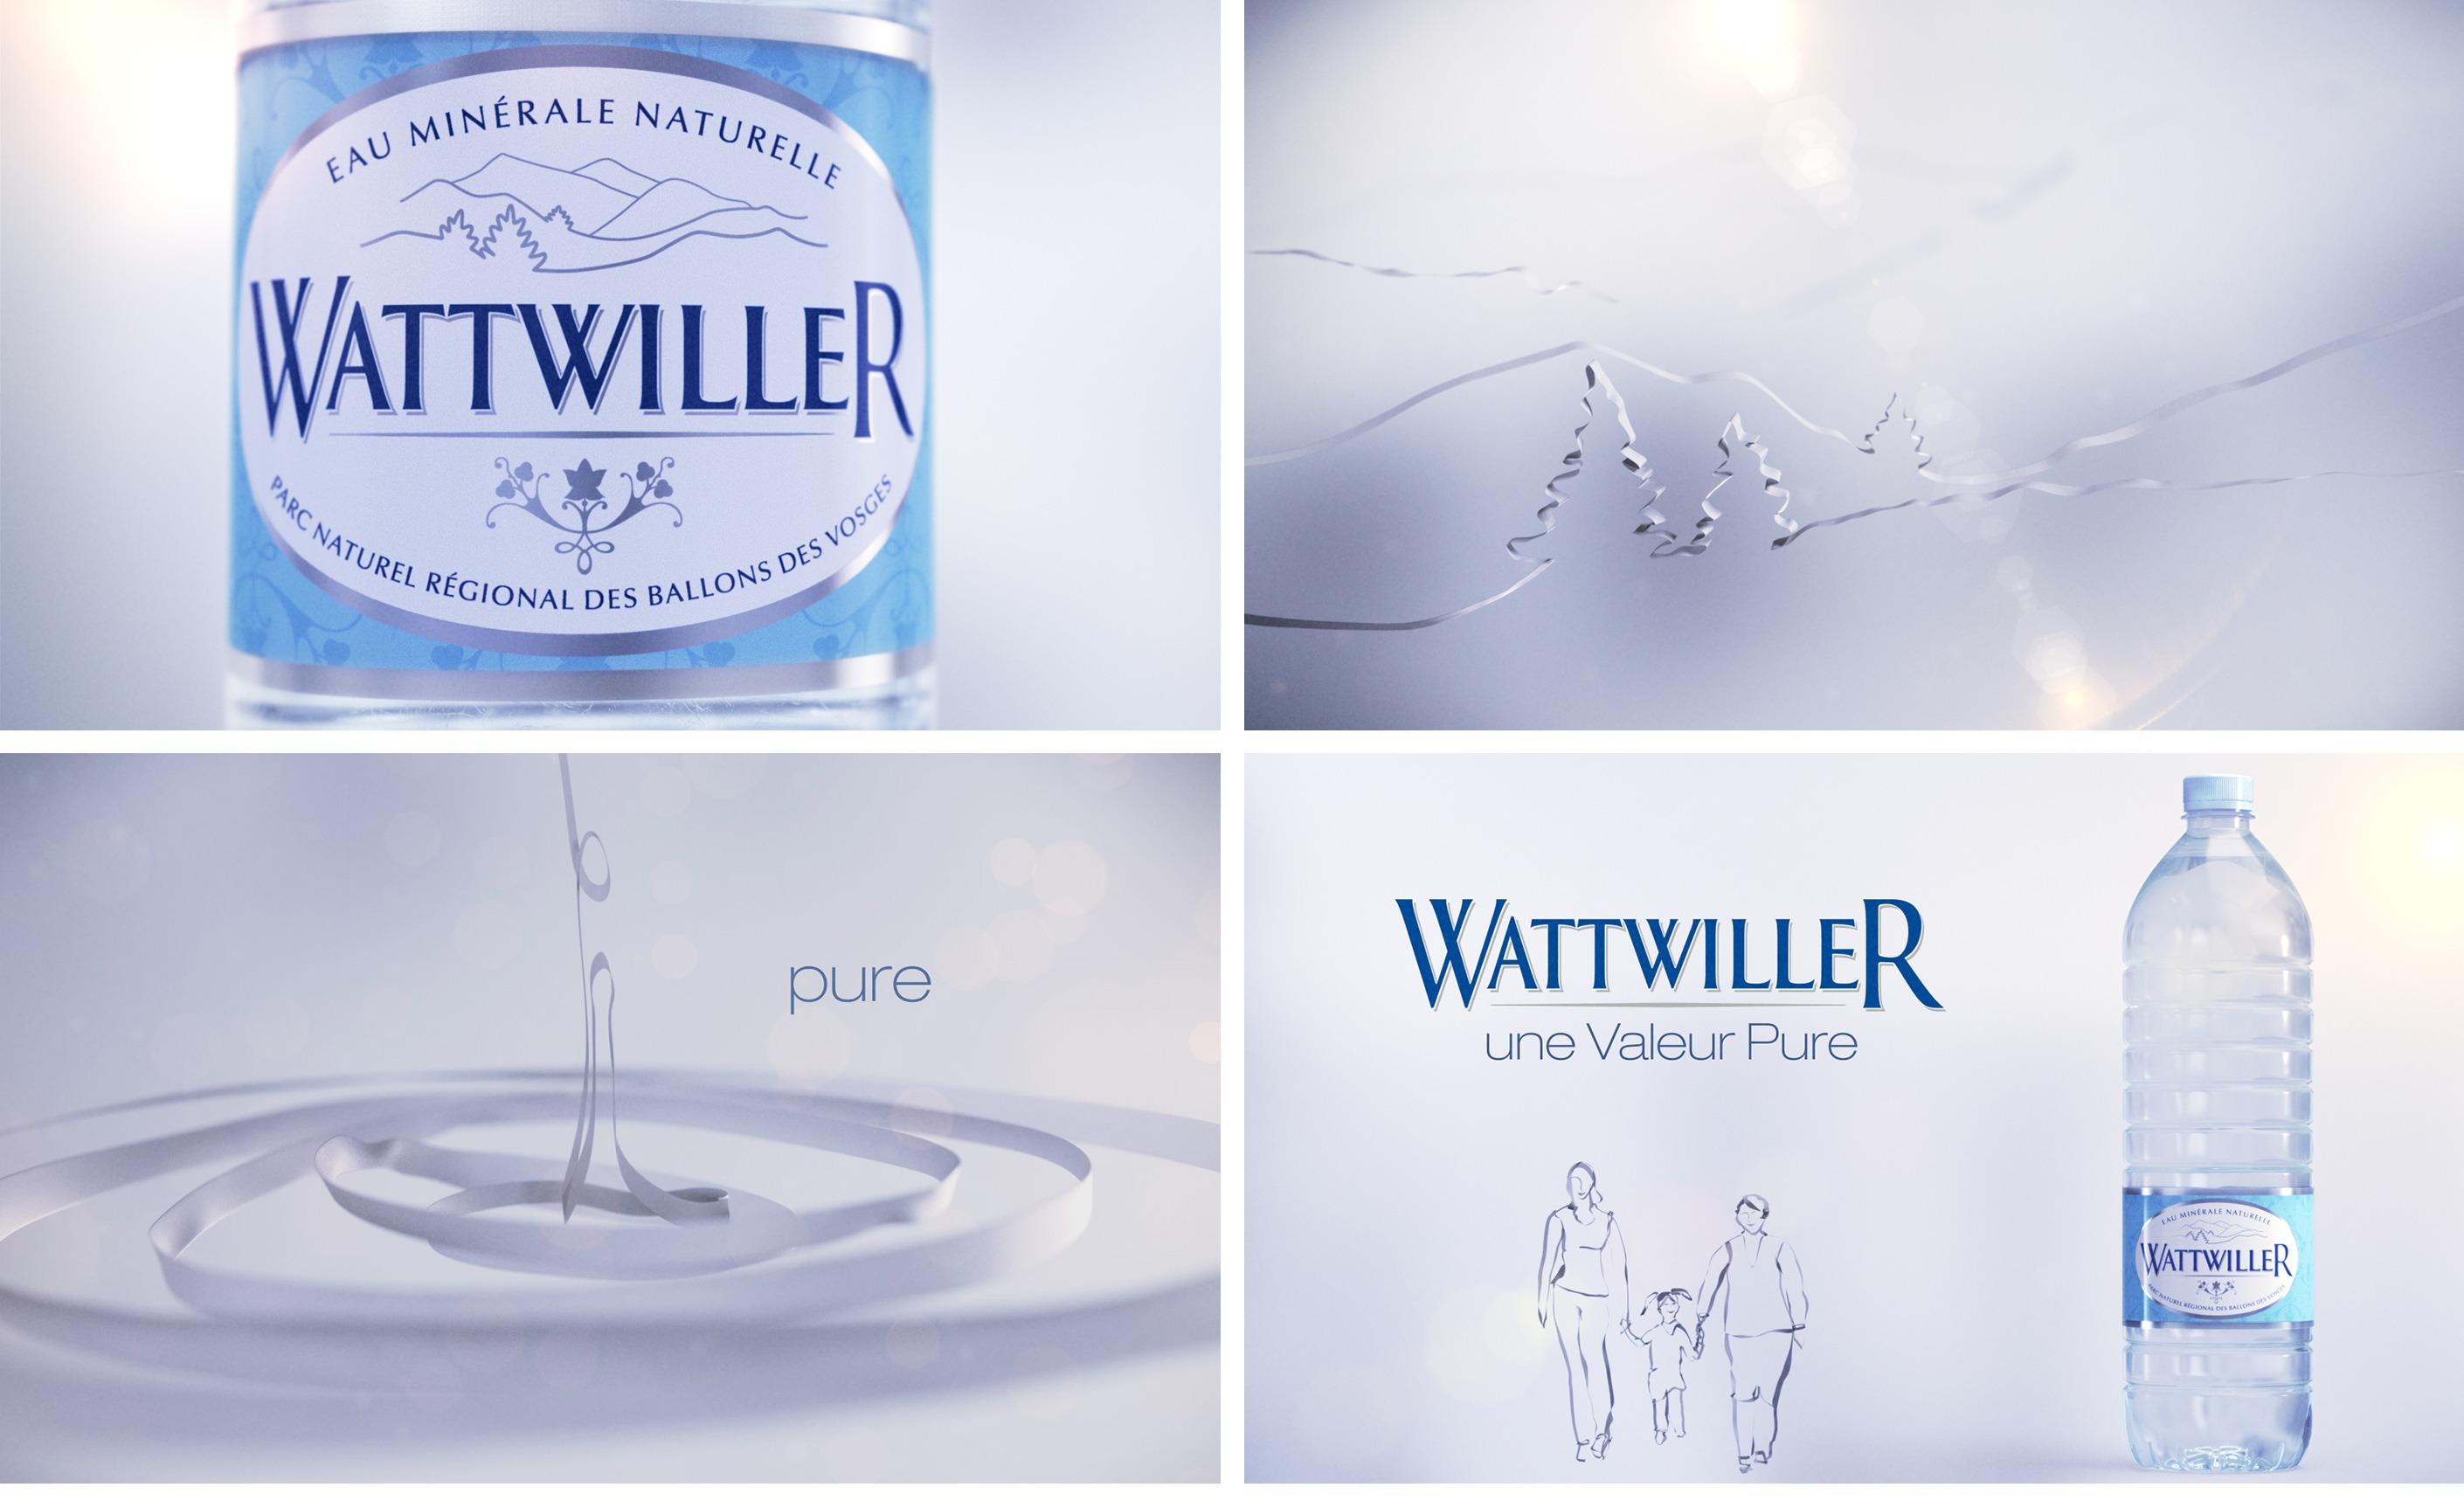 stas3dart-wattwiller-water-promotional-tv-advertisement-animation